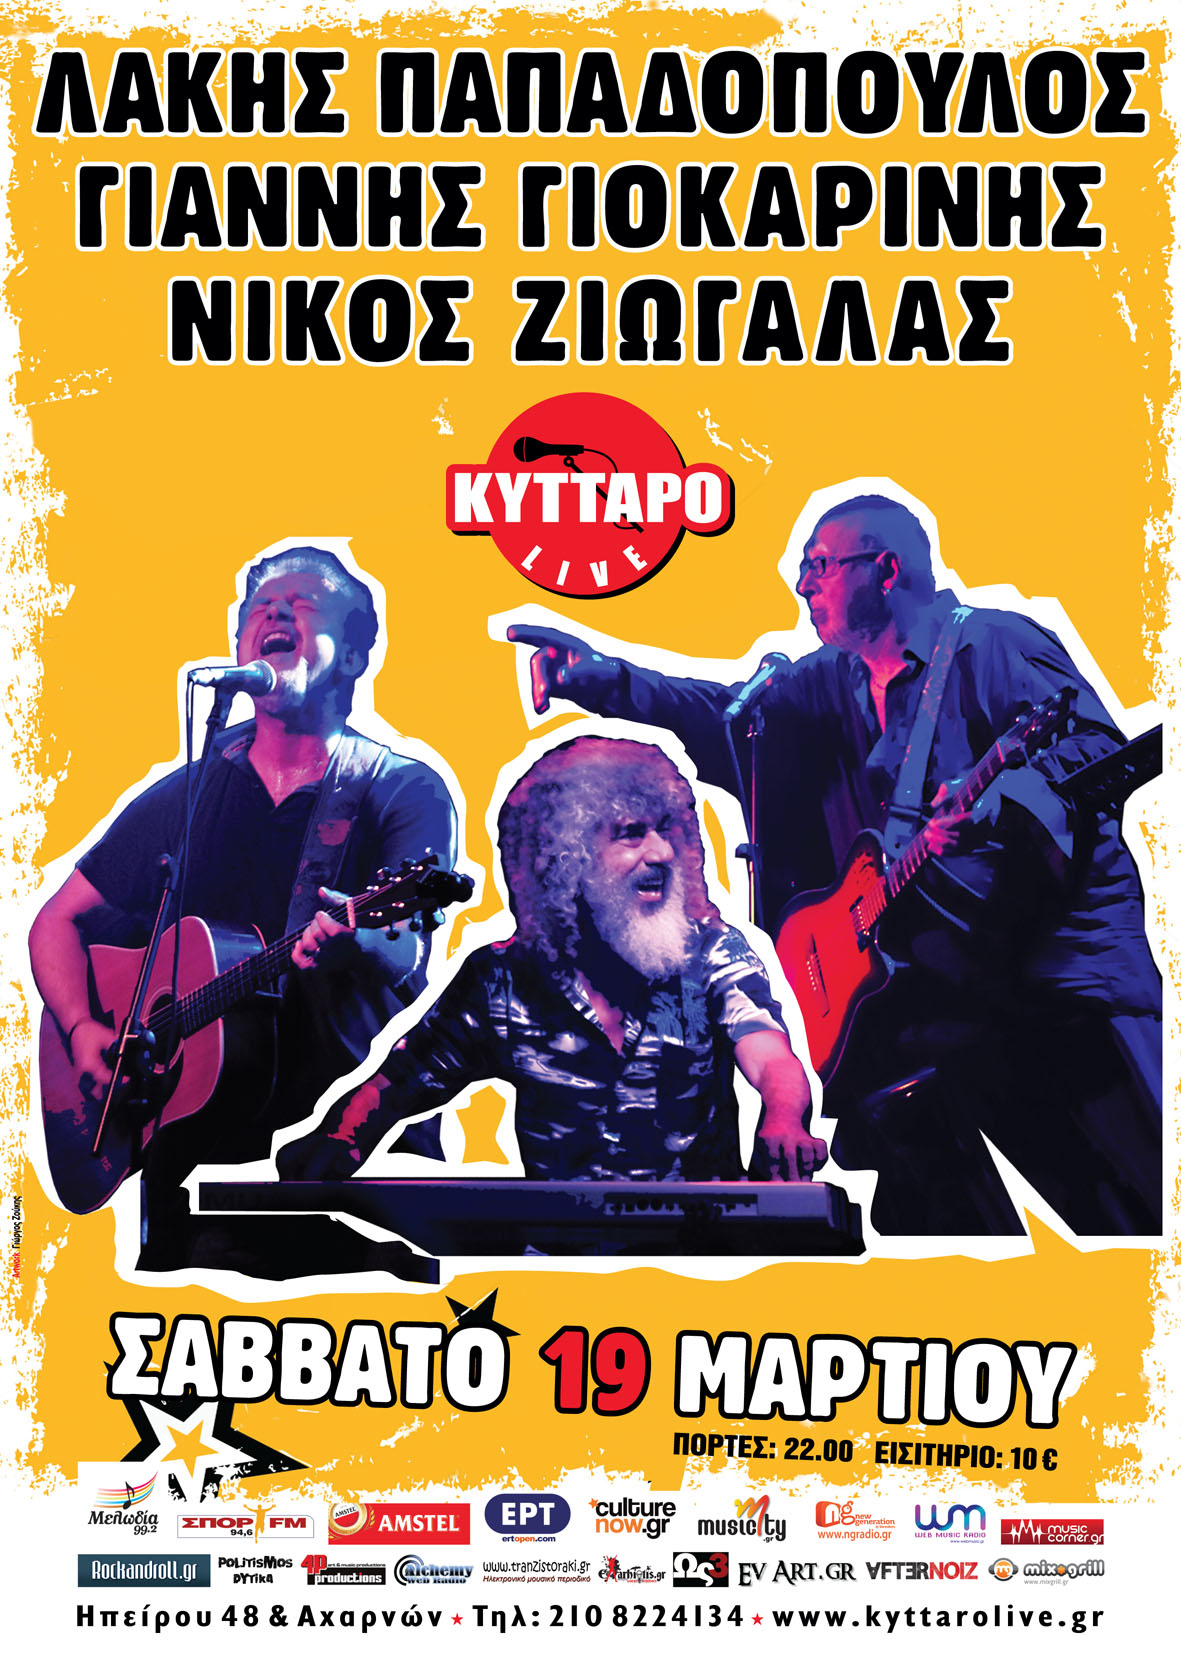 Kyttaro 19 March_50x70.cdr